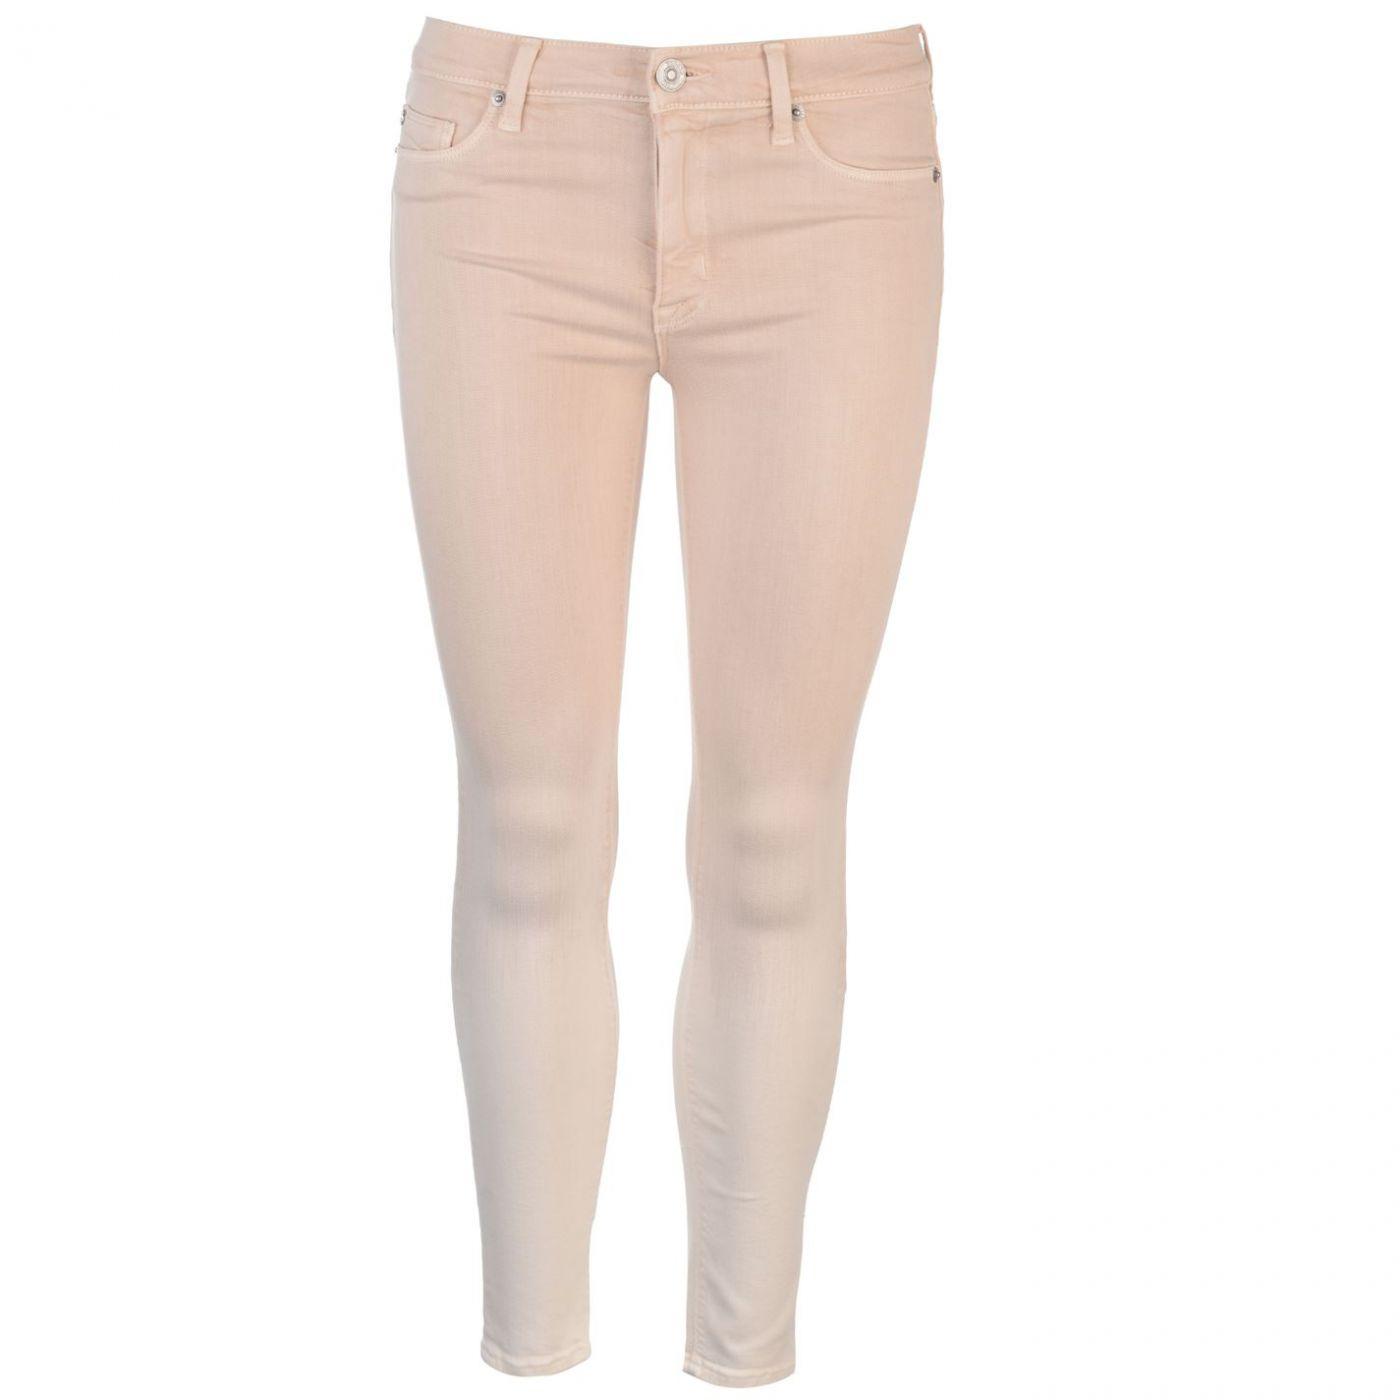 Hudson Jeans Nico Ankle Jeans Ladies